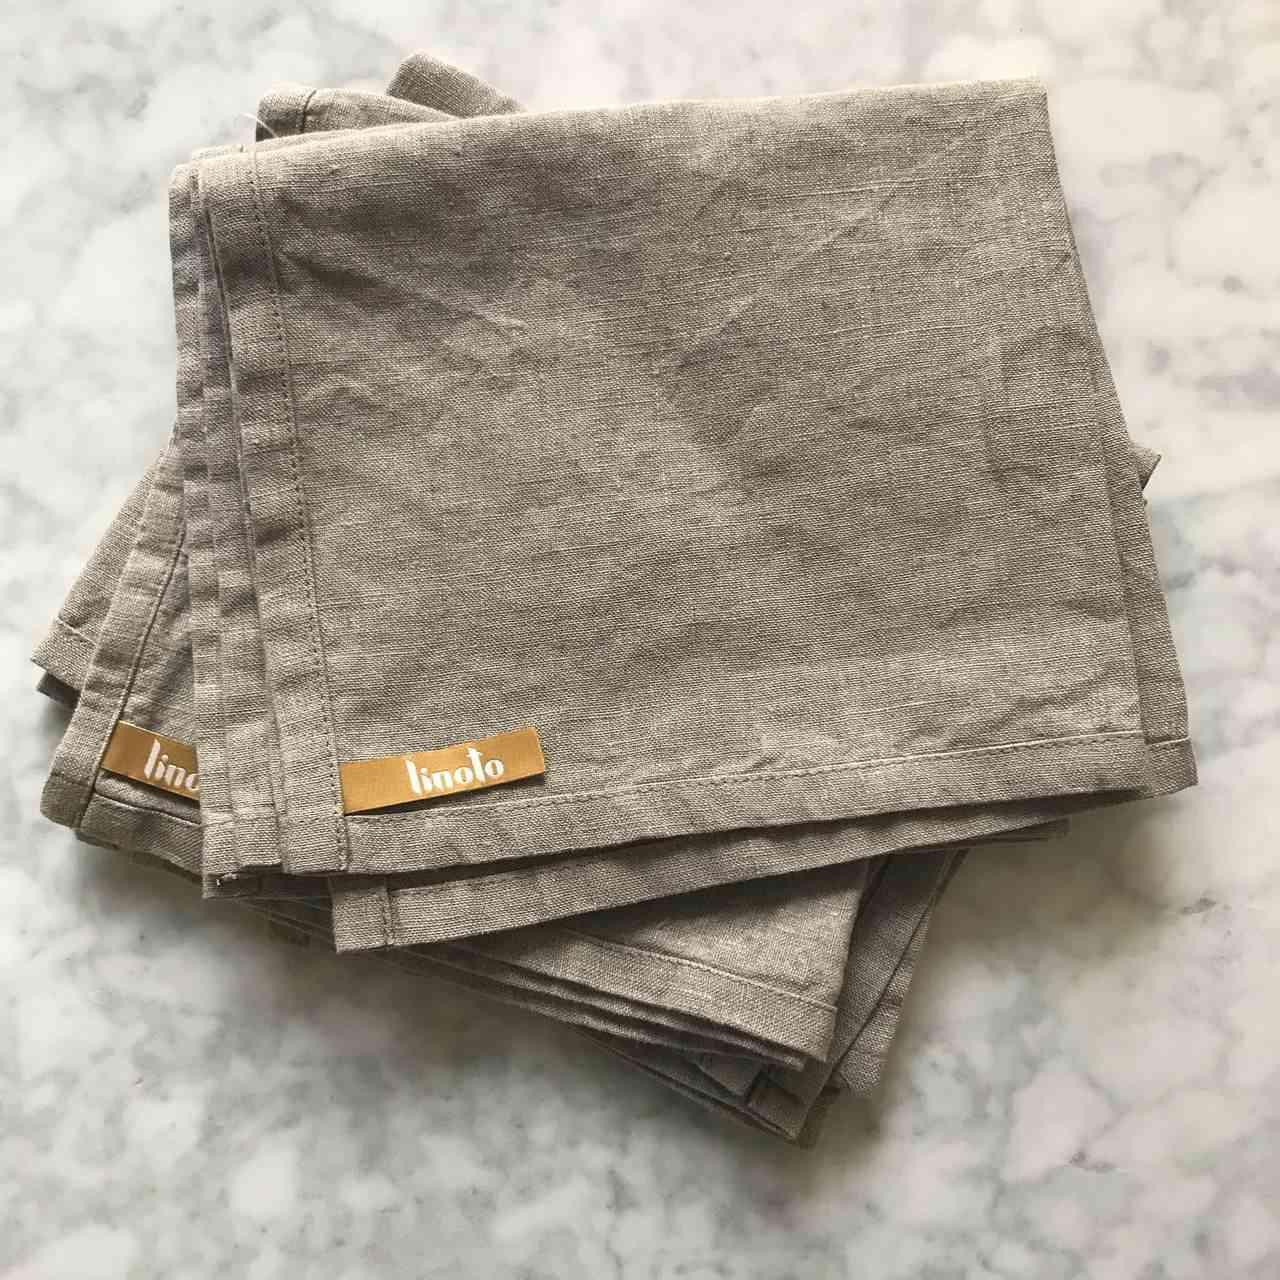 Linoto House Helper Treeless Linen Towels